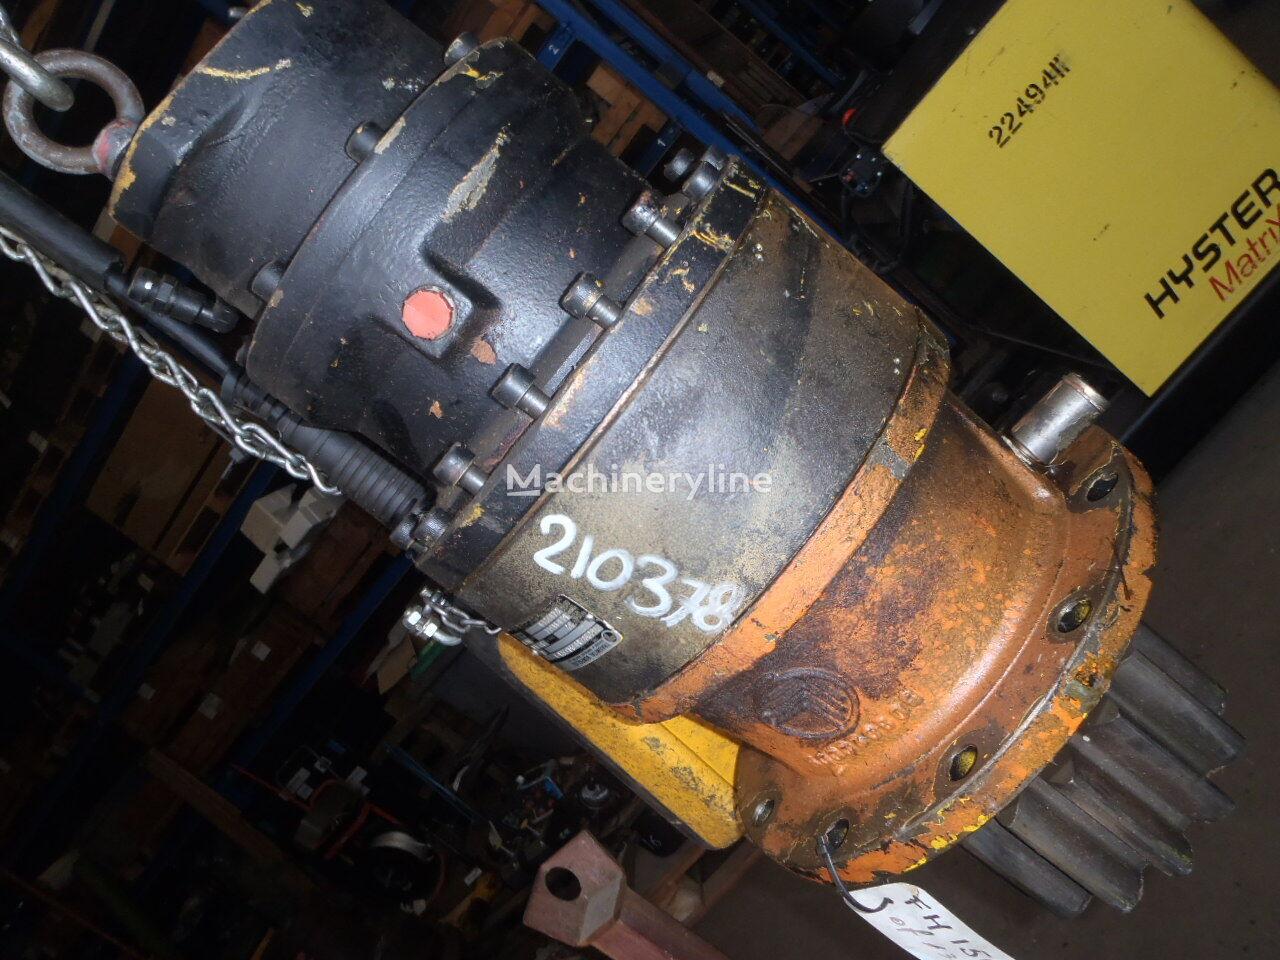 FIAT-HITACHI TRASMITAL 705T2-S035A.32T-1 reductor pentru FIAT-HITACHI FH150W excavator